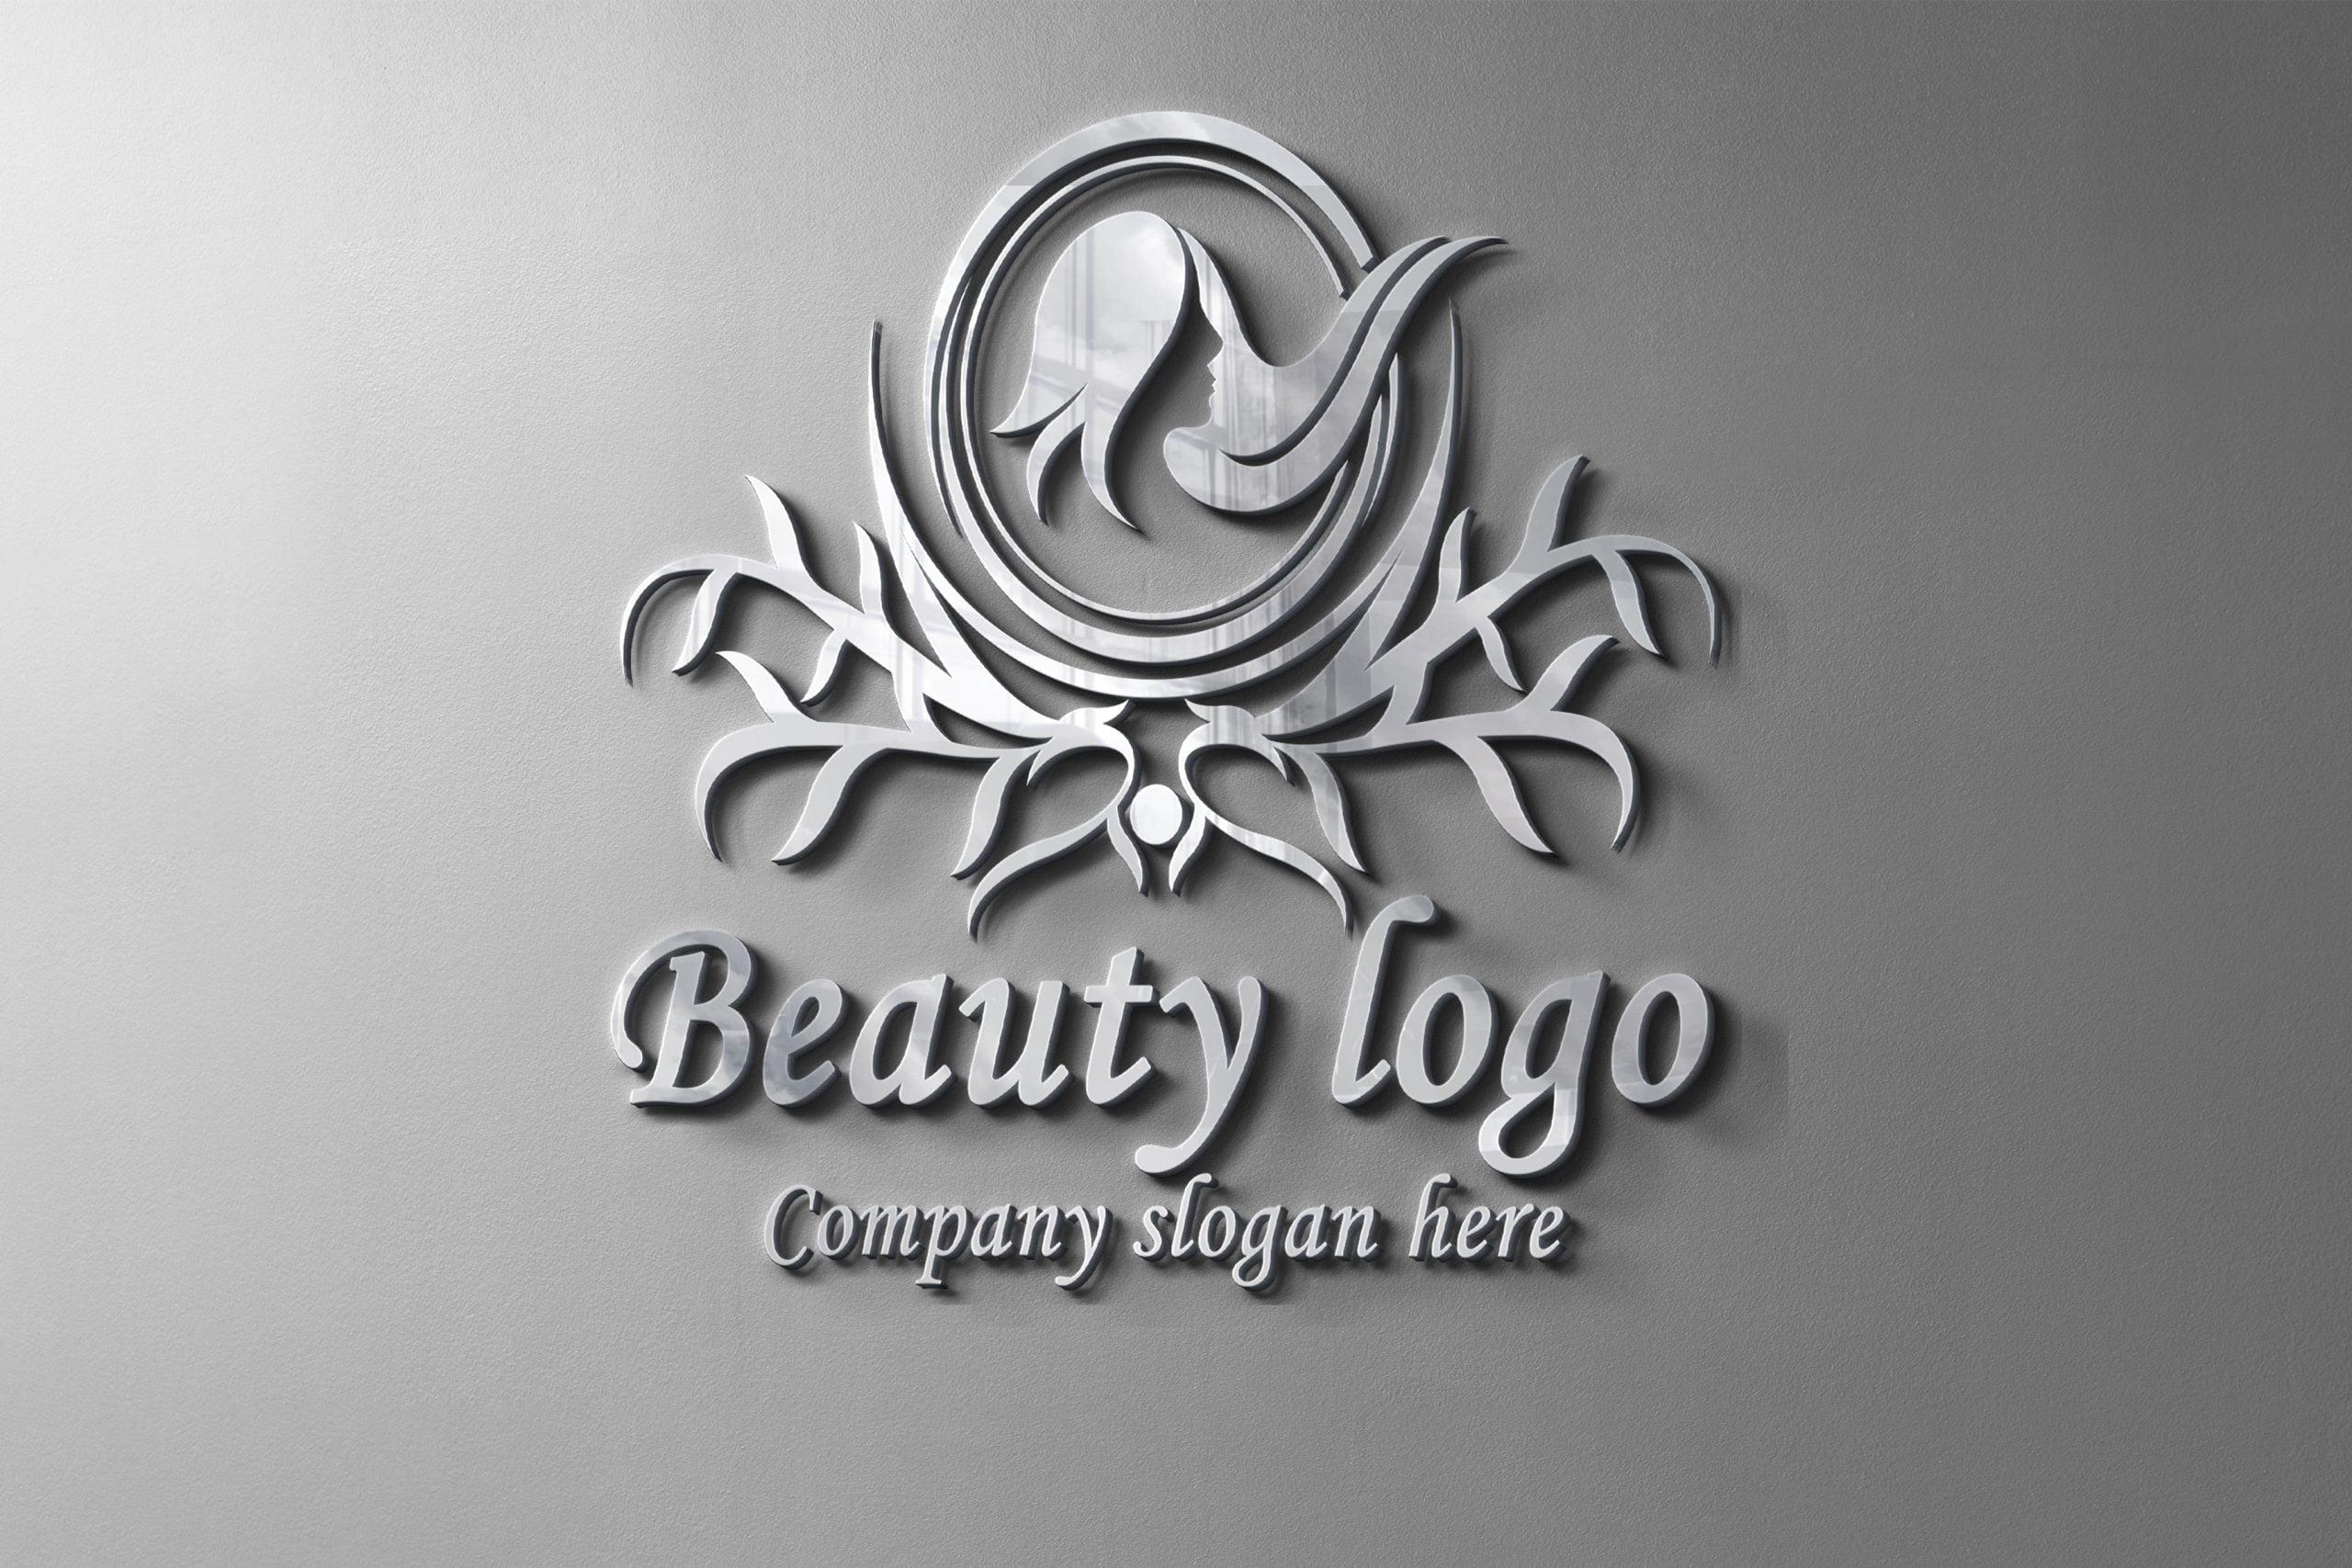 Luxury Beauty Logo Design With metal wall